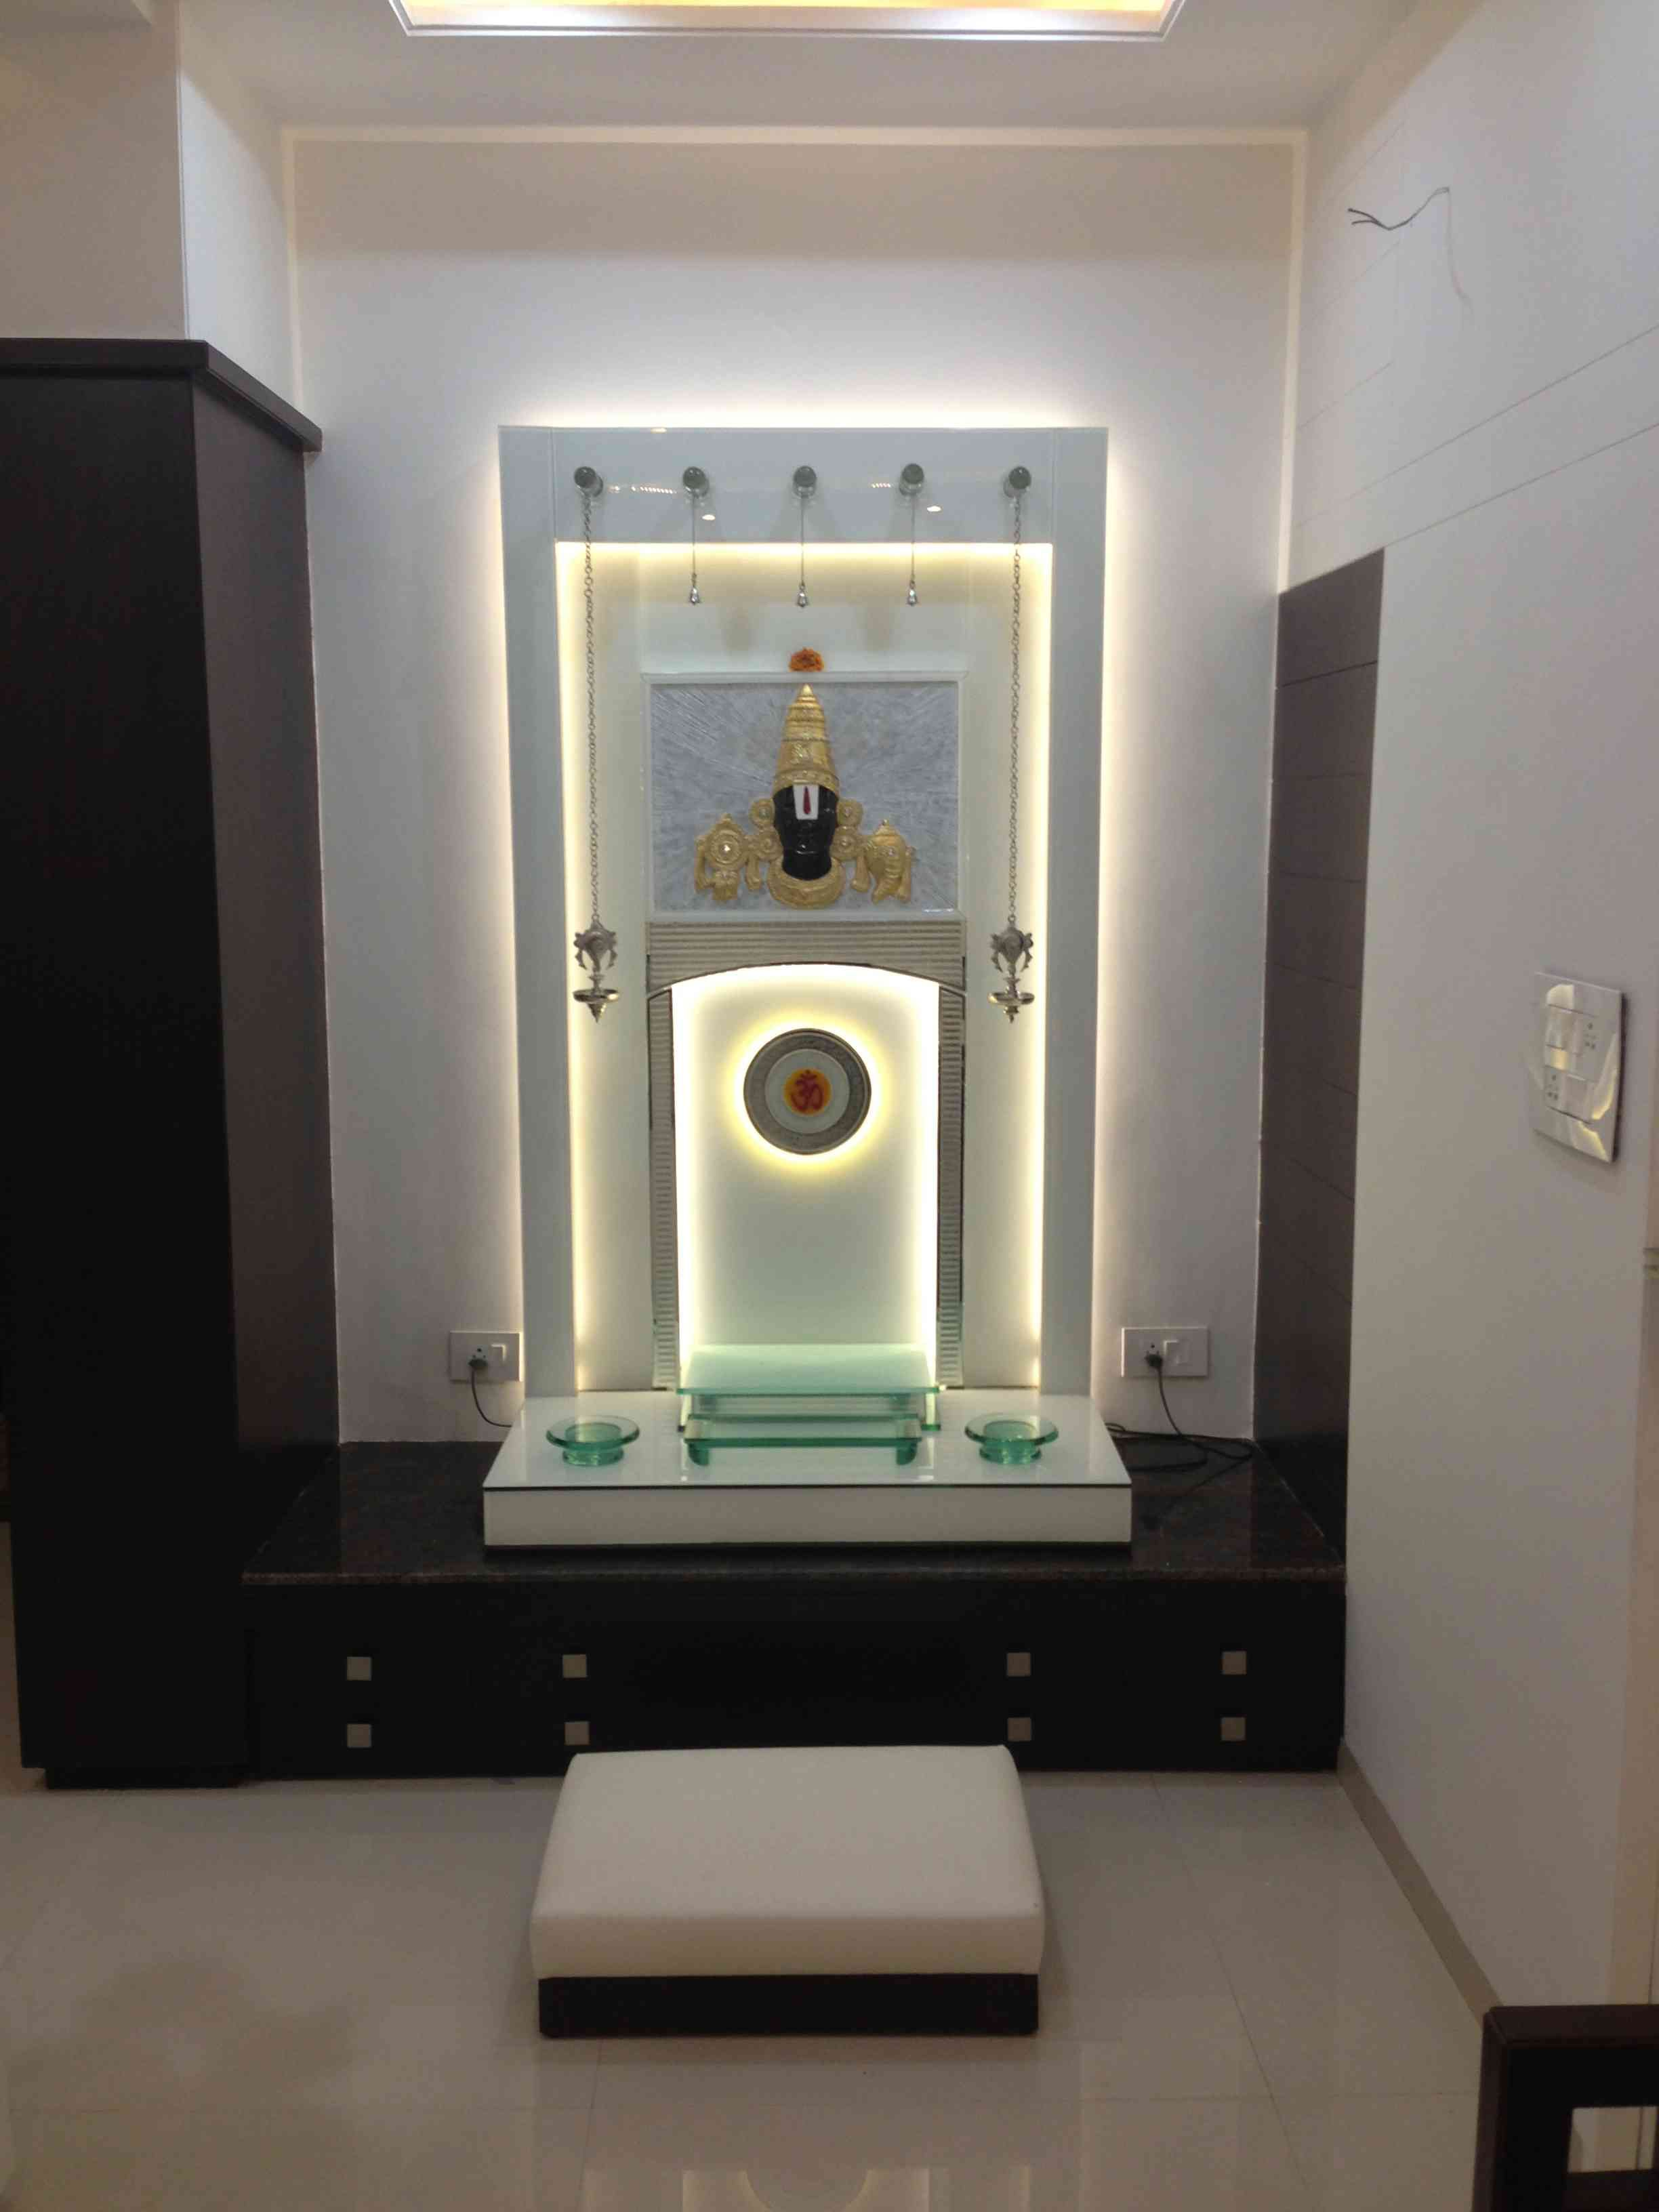 Prayer room ideas pictures remodel and decor - Pooja Mandir Design Ideas By Ambarish Golawar Architect In Nagpur Maharashtra India